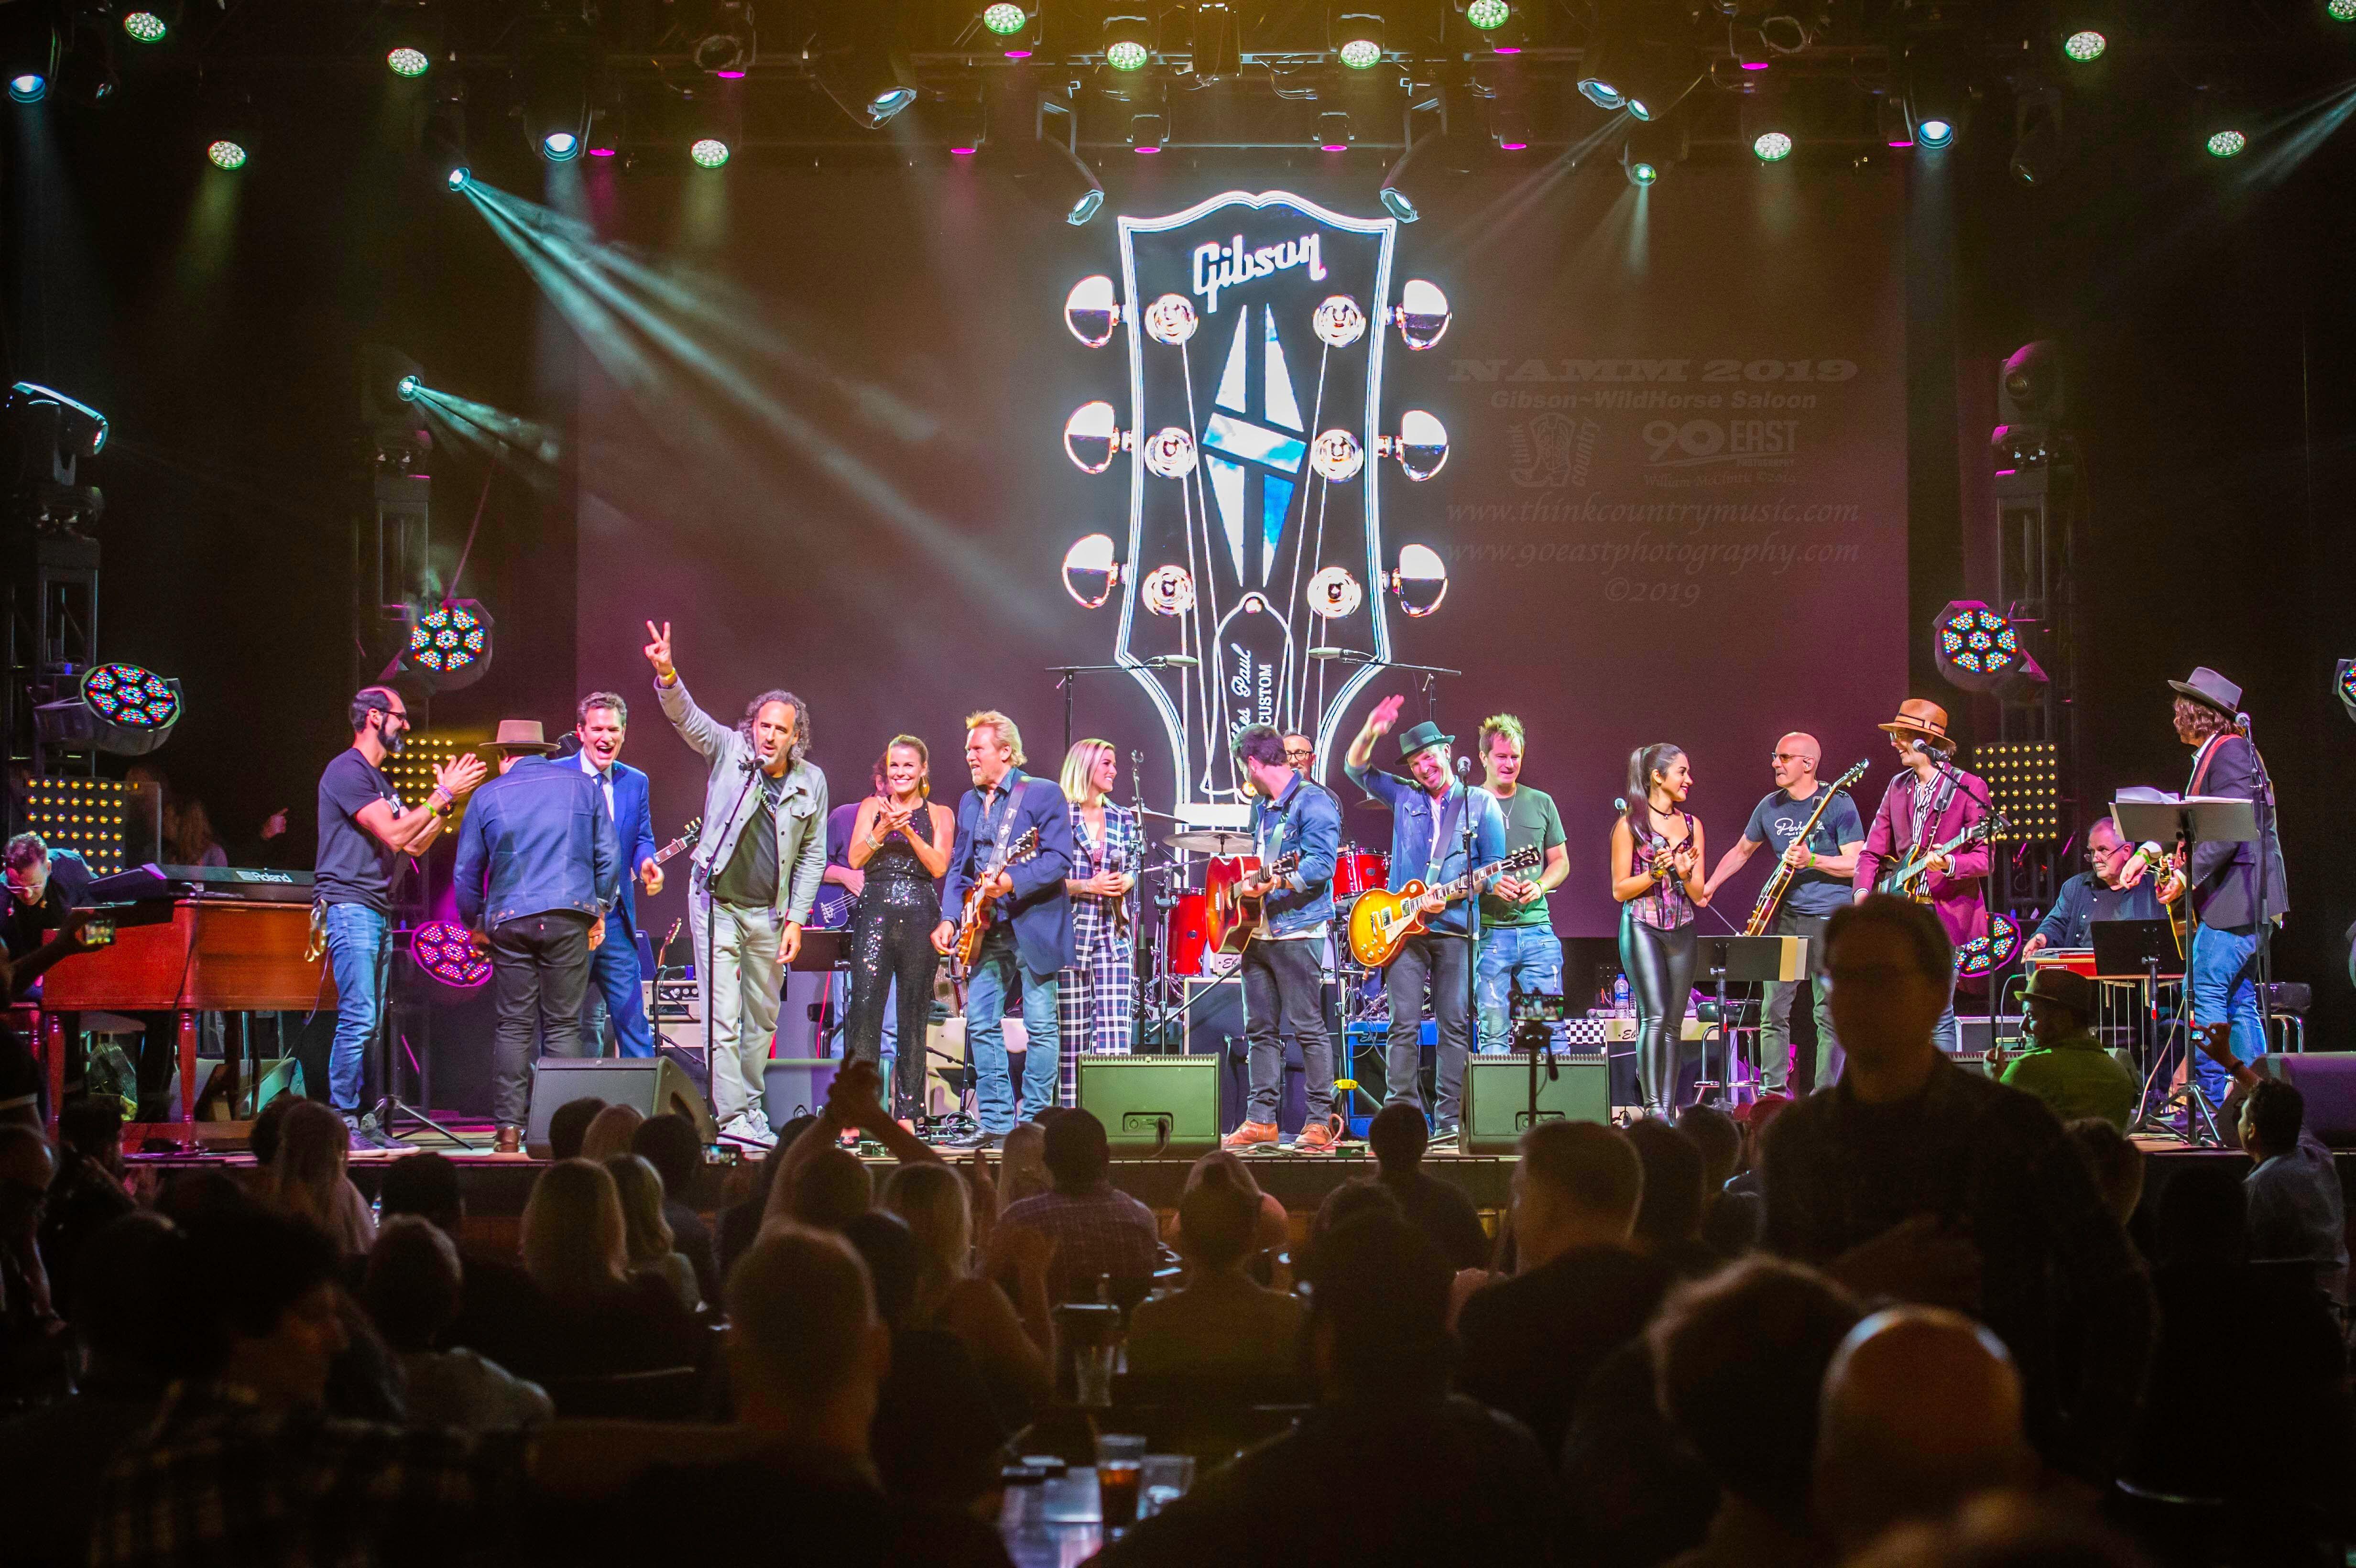 Gibson Summer NAMM Jam 2019 Rocks the Wildhorse  